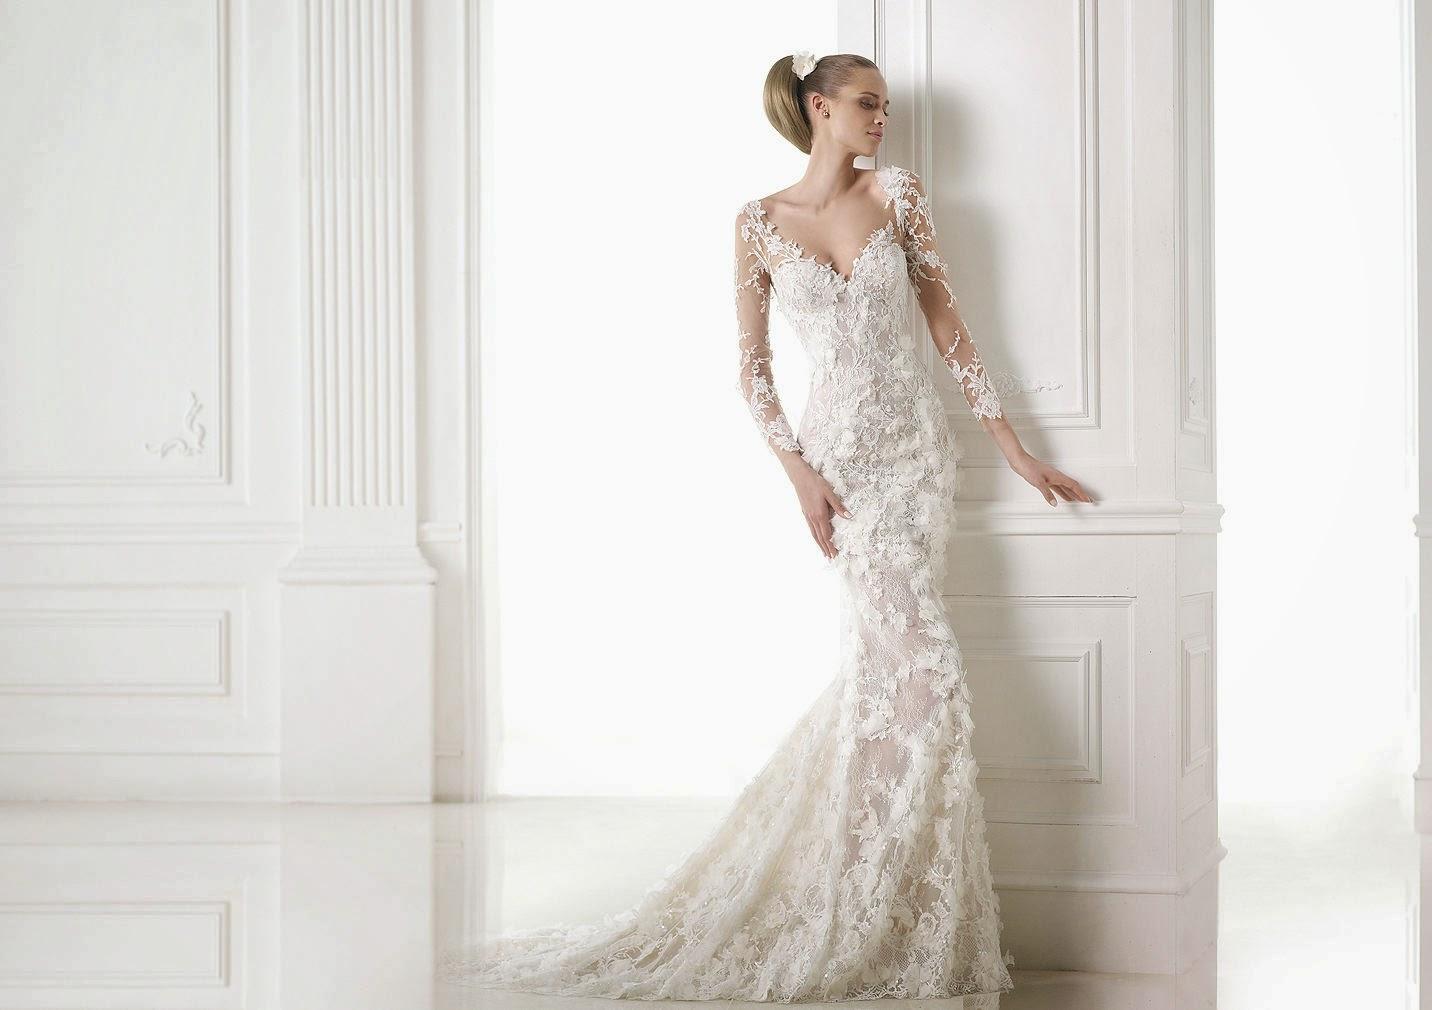 Mermaid Wedding Dresses, Pronovias 2015 Collection